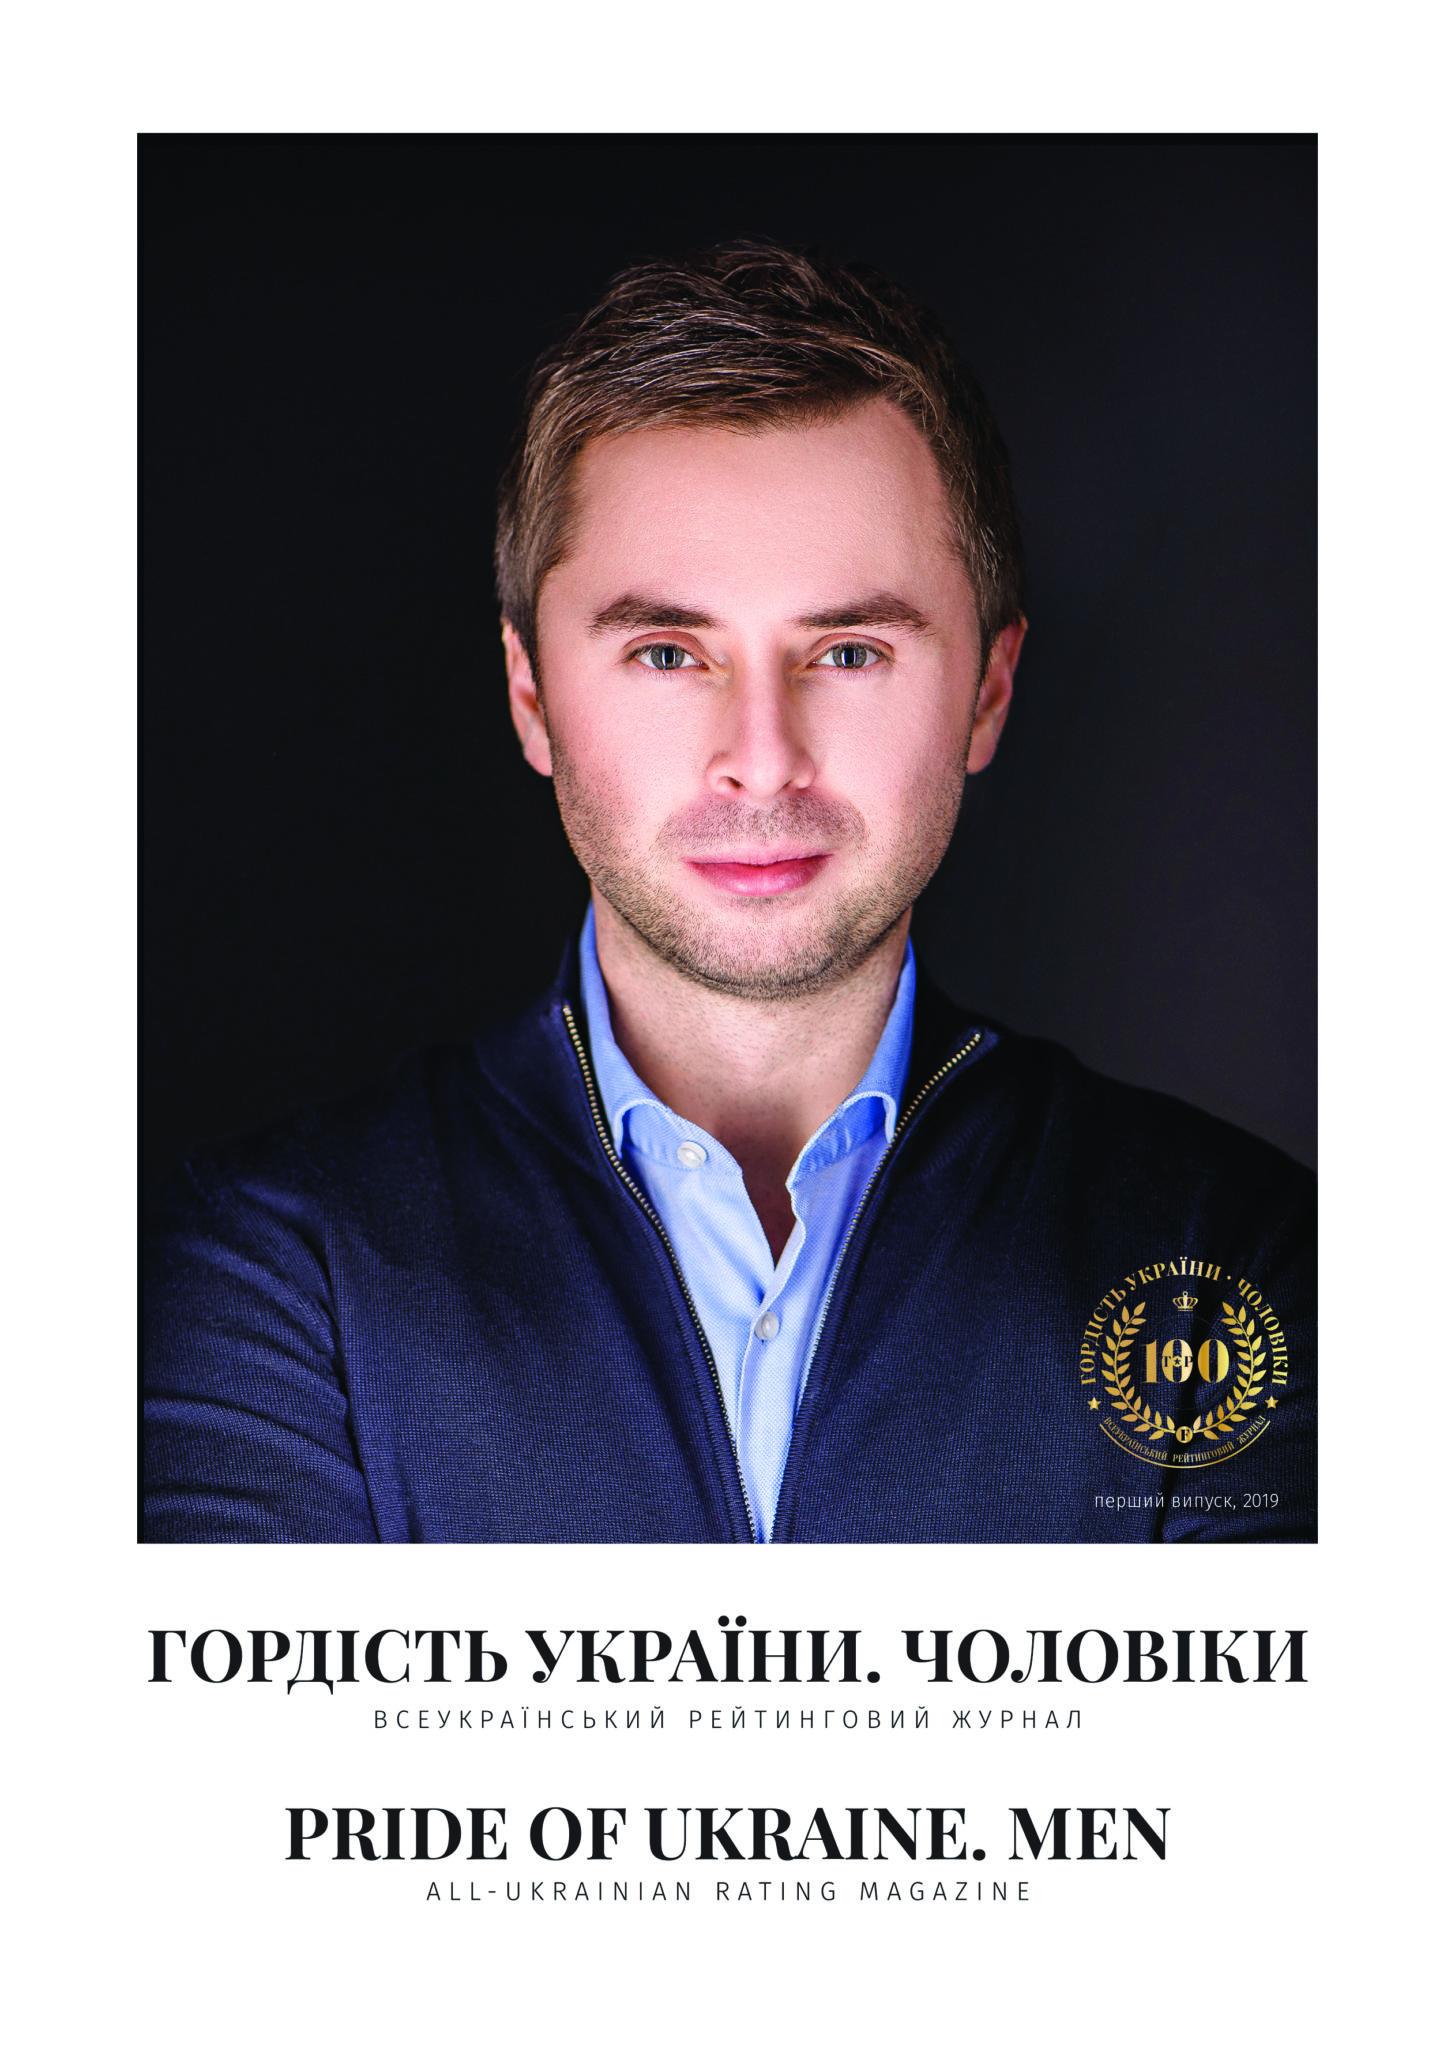 Максим Слободянюк для журнала Financoff и рейтинга Гордість України. Чоловіки